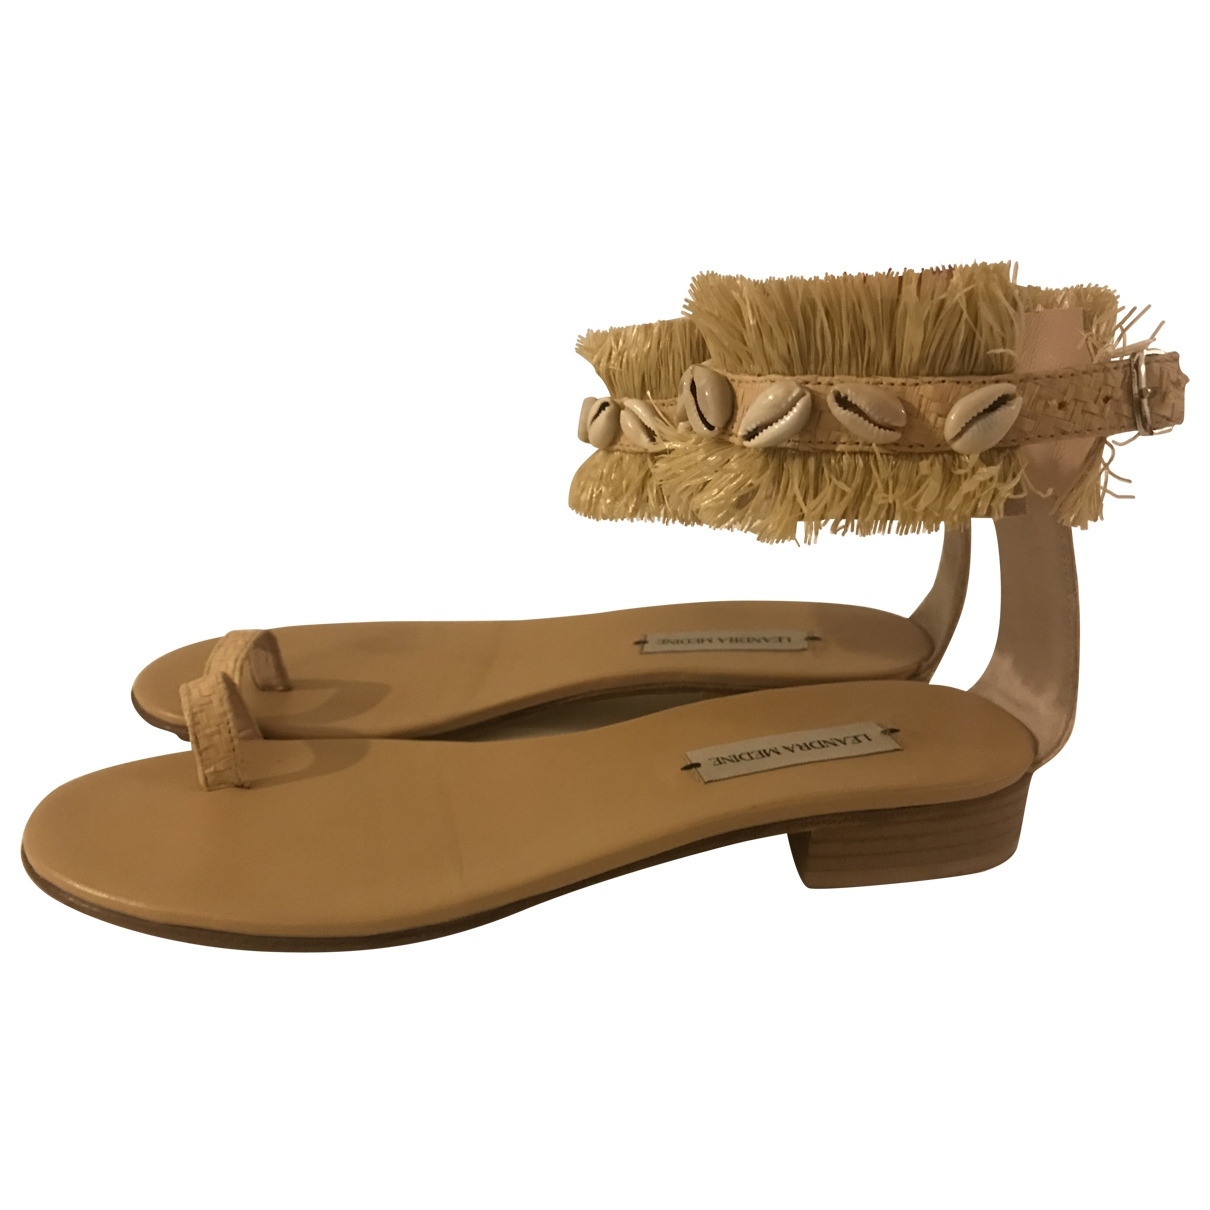 Sandalias romanas Hippie Chic de Lona Non Signe / Unsigned